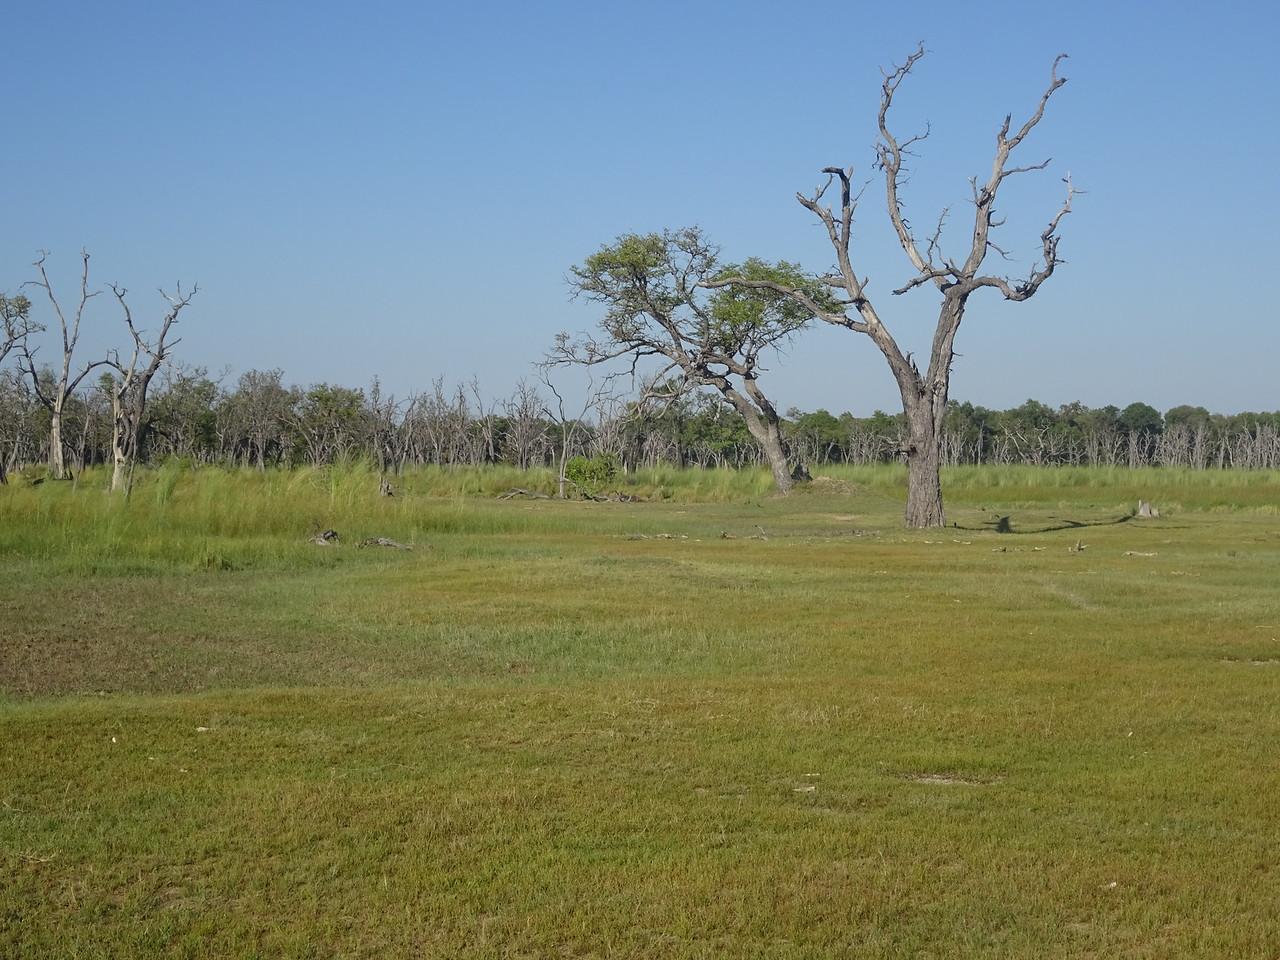 052_Okavango Delta, Moremi Game Reserve  4WD Safari